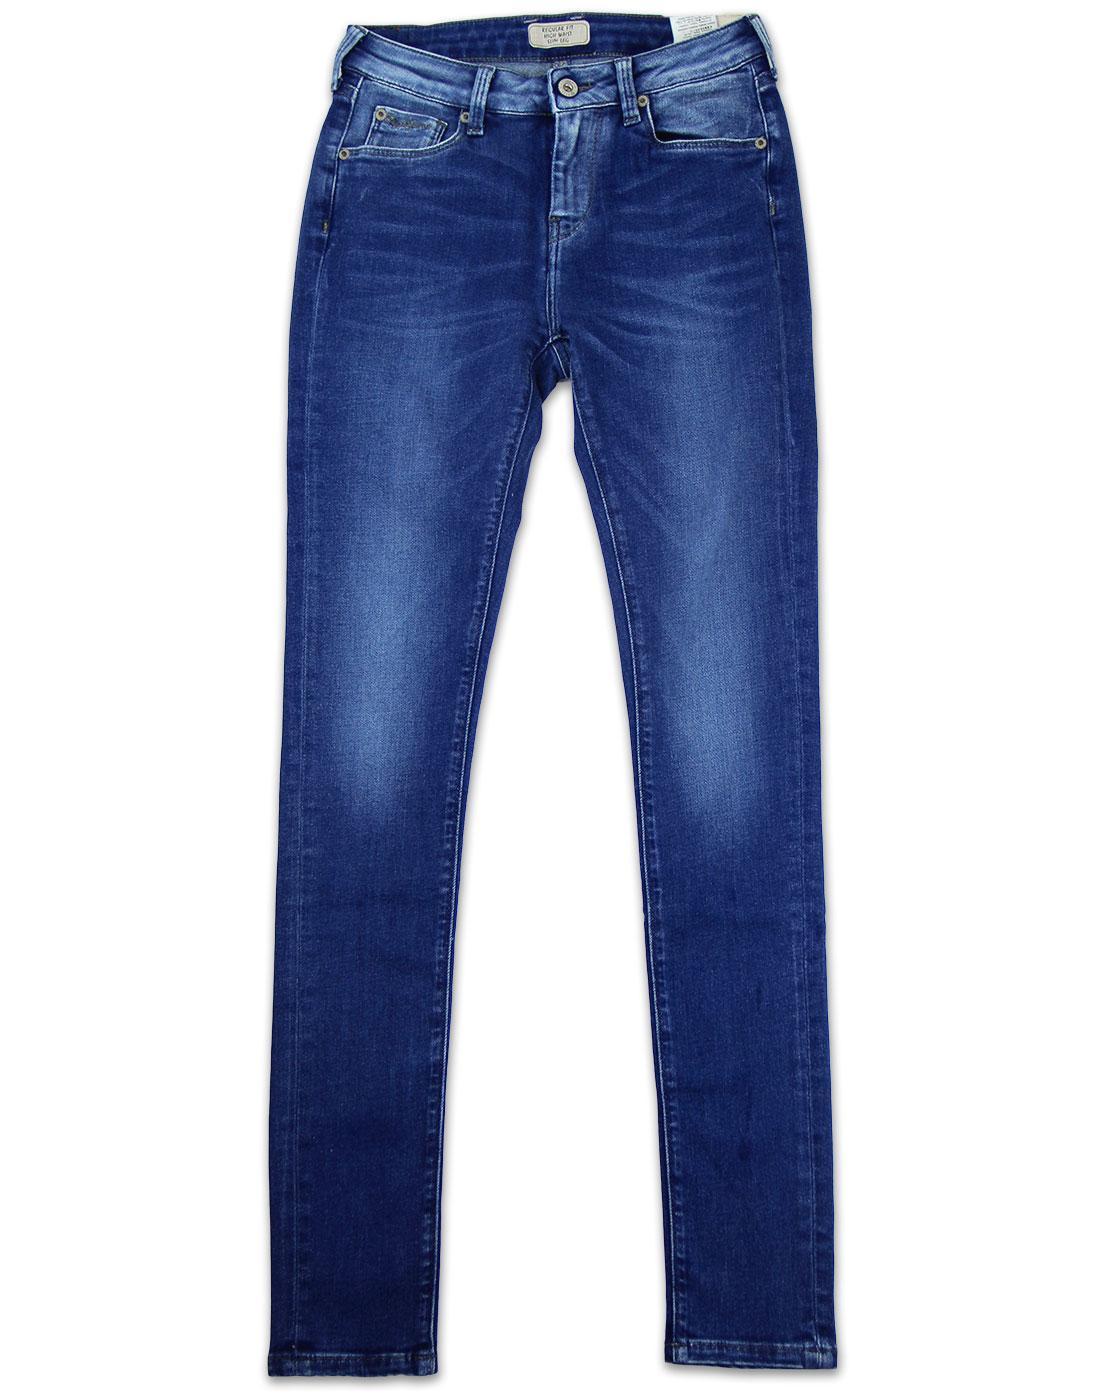 PEPE JEANS Regent Retro Skinny Denim Jeans M46